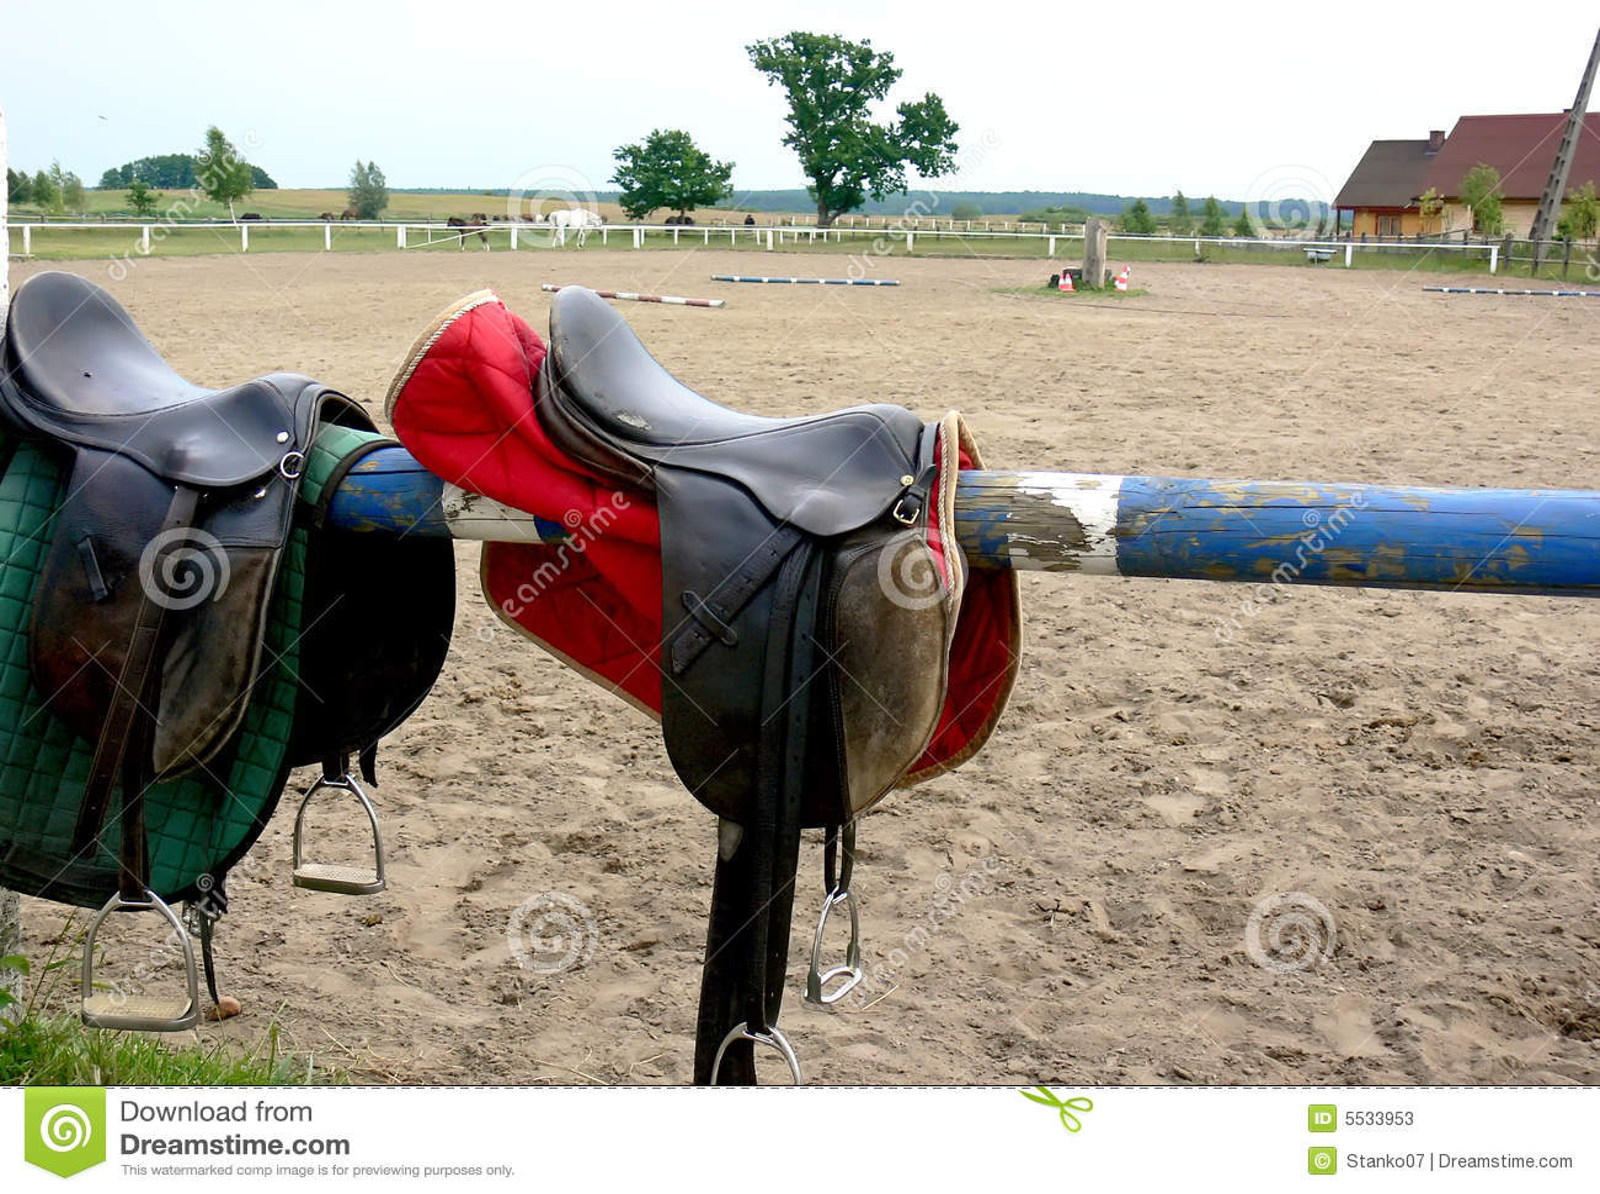 Horse riding item